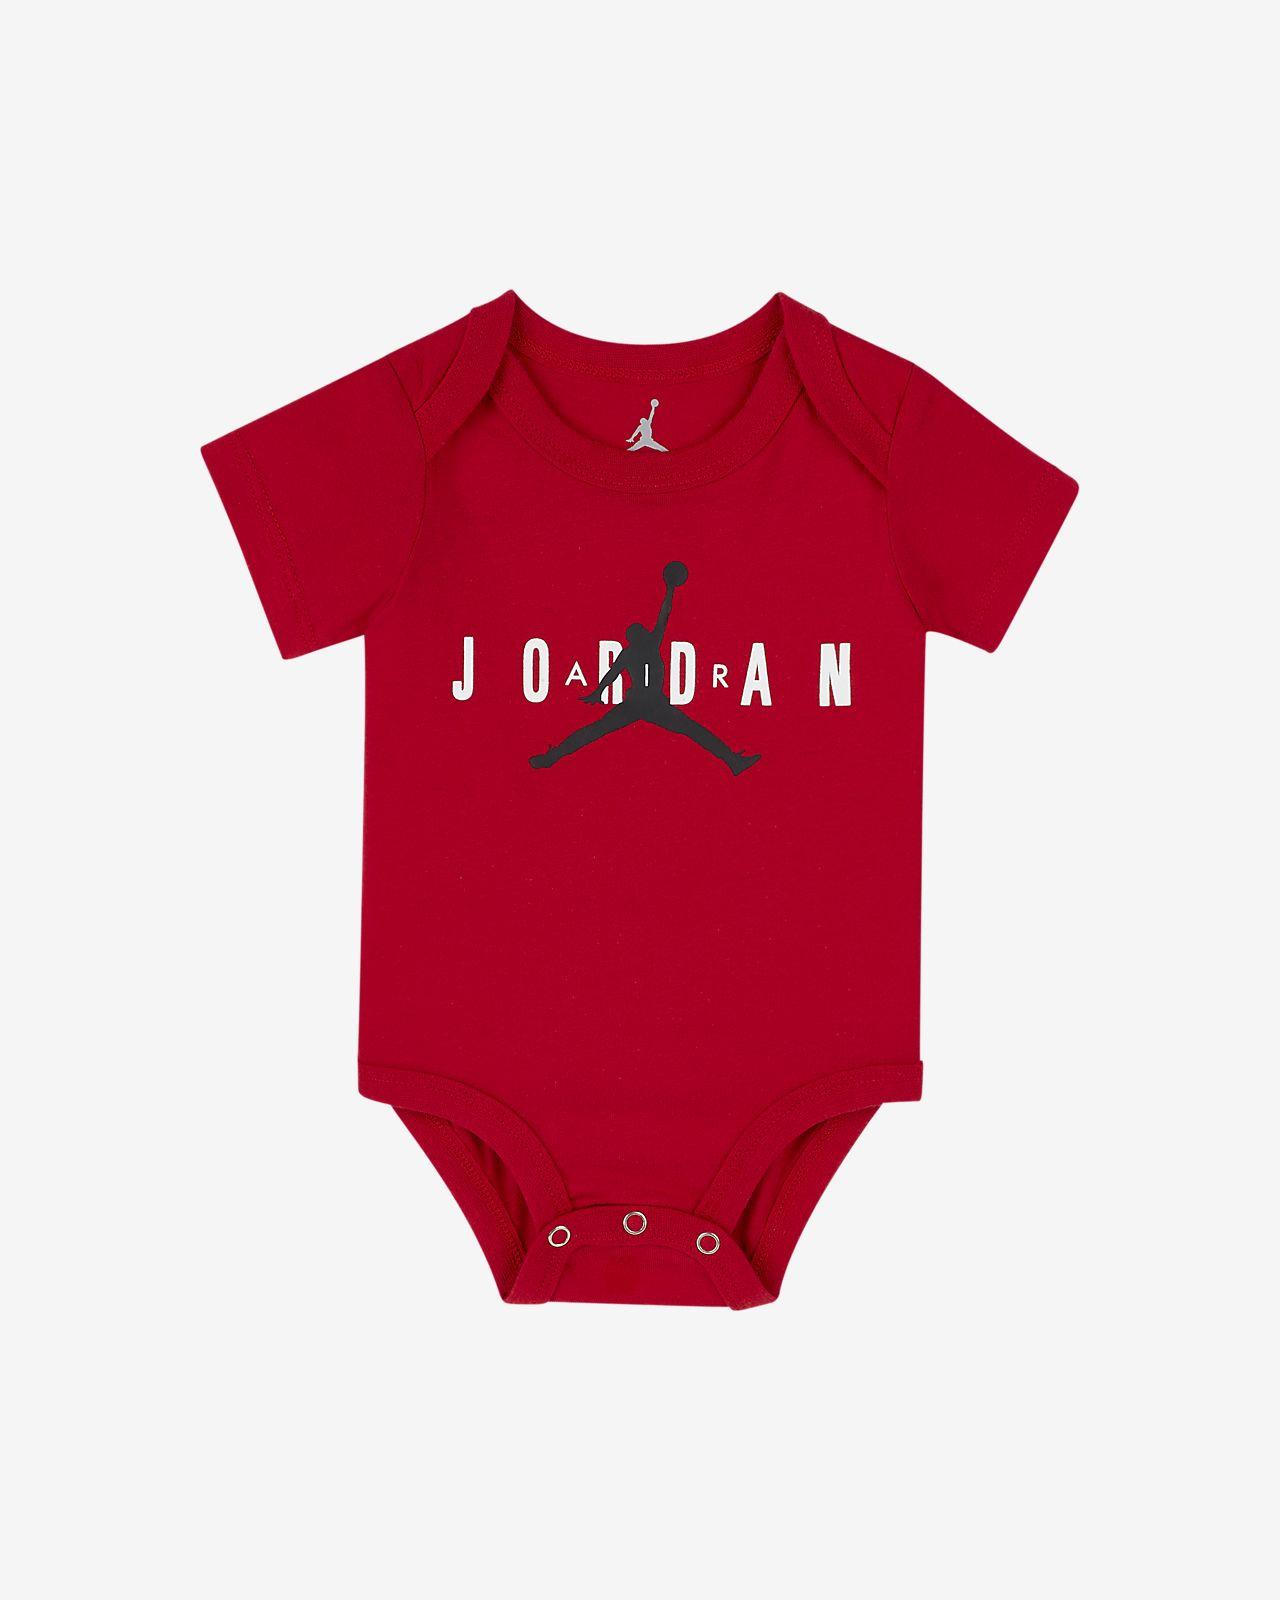 Jordan Jumpman Kleinkinder-Bodysuit mit Grafik